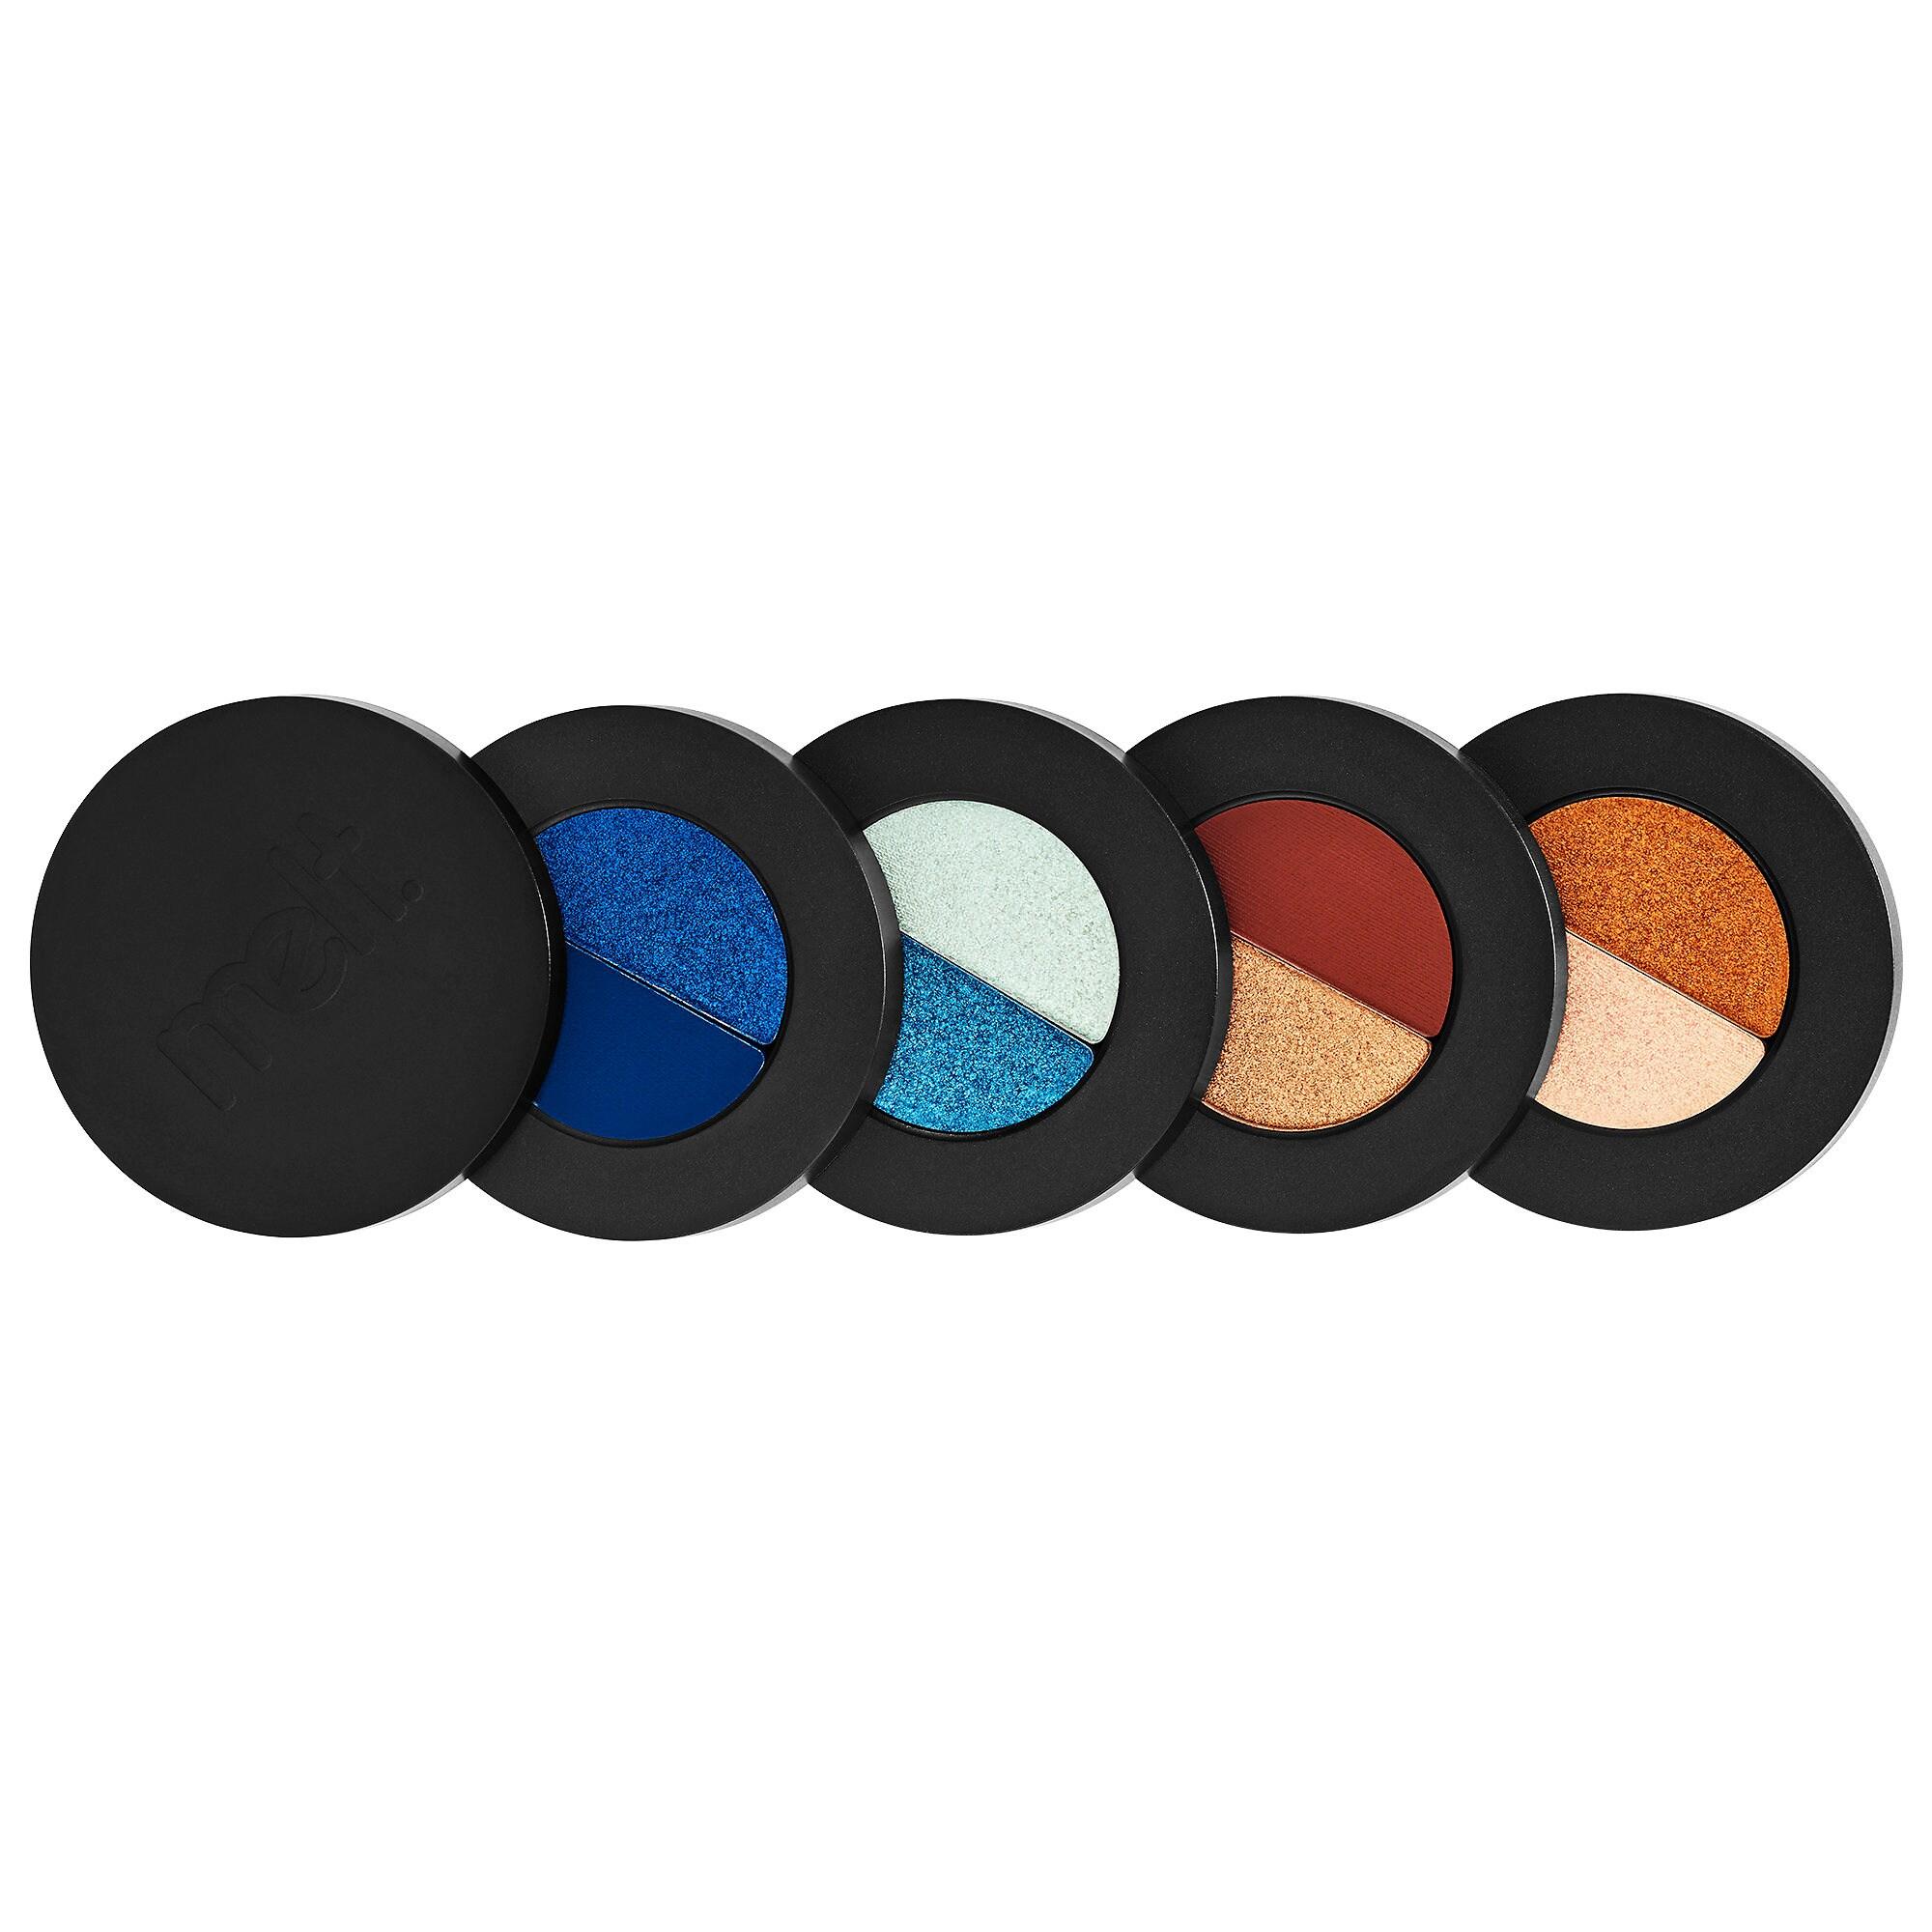 Melt Cosmetics - Blueprint Eyeshadow Palette Stack